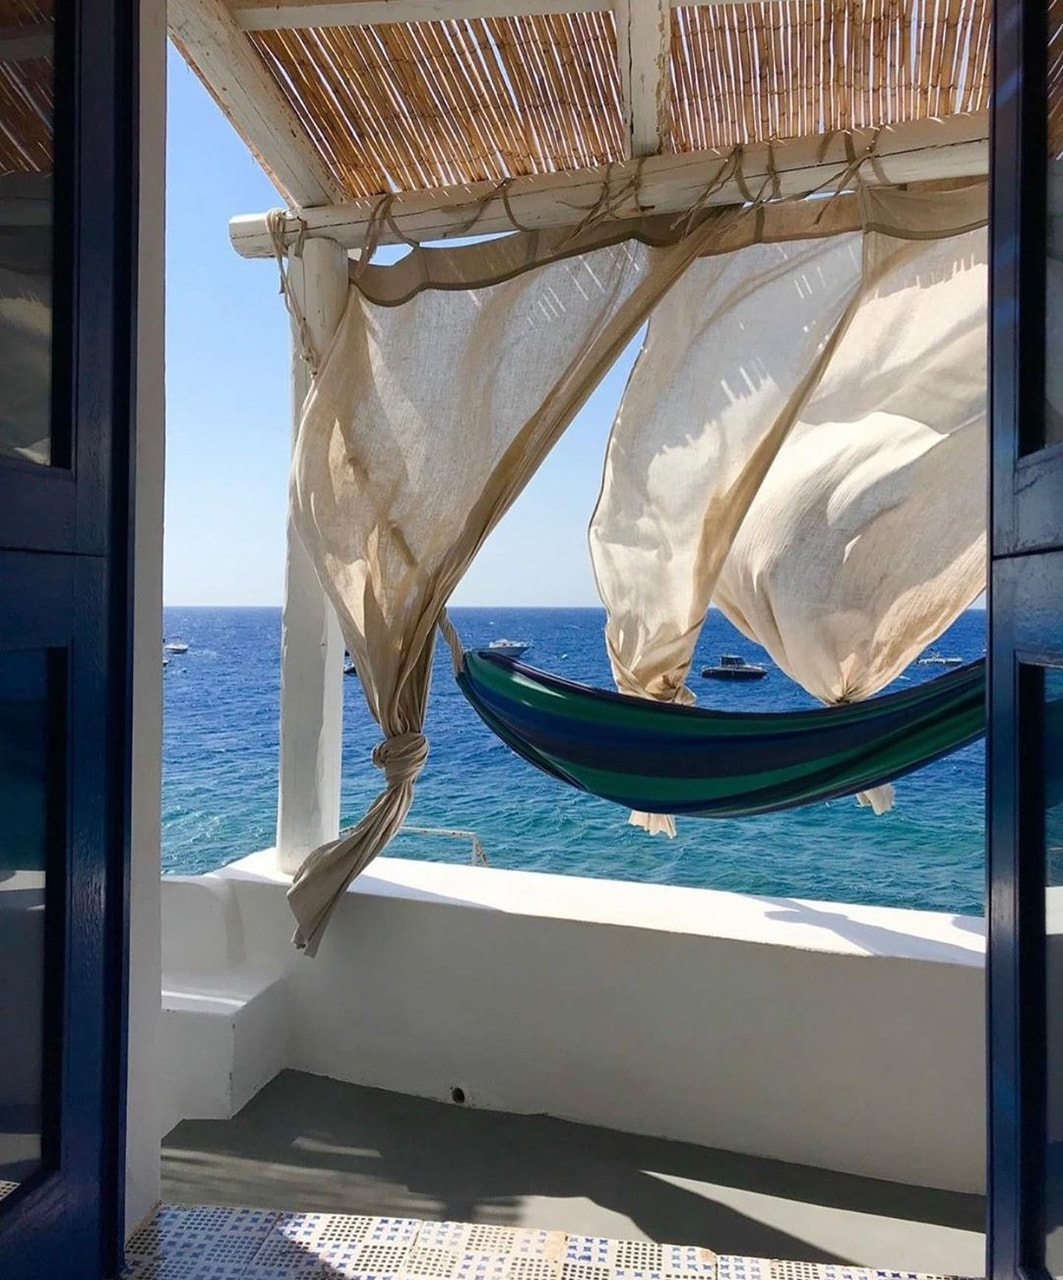 sea and travel imageの画像